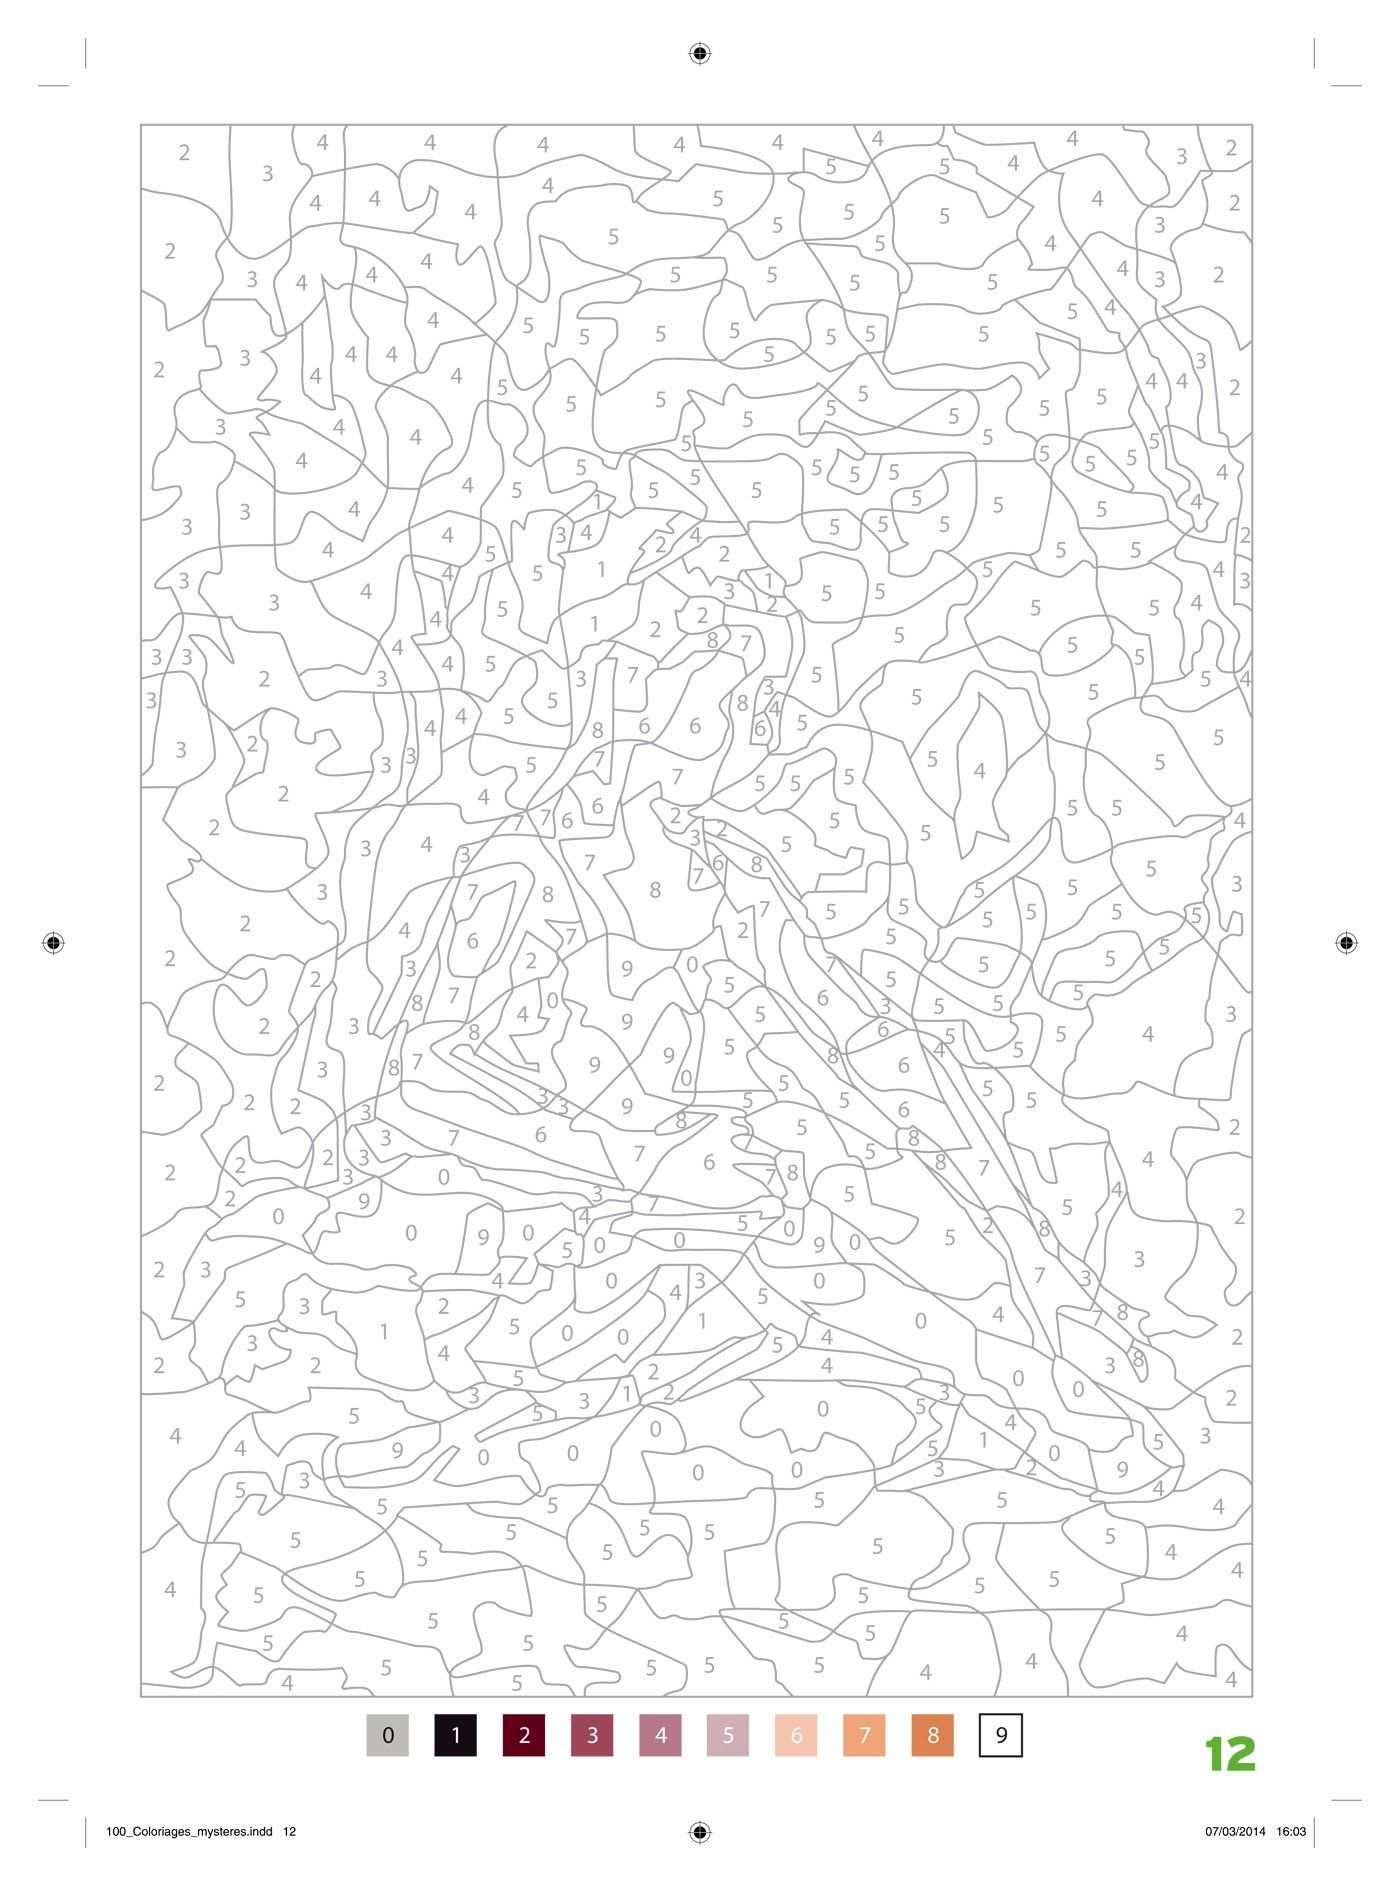 100 Coloriages Mysteres Amazon De Jeremy Mariez Fremdsprachige Bucher Mandala Malvorlagen Malen Nach Zahlen Malen Nach Zahlen Vorlagen